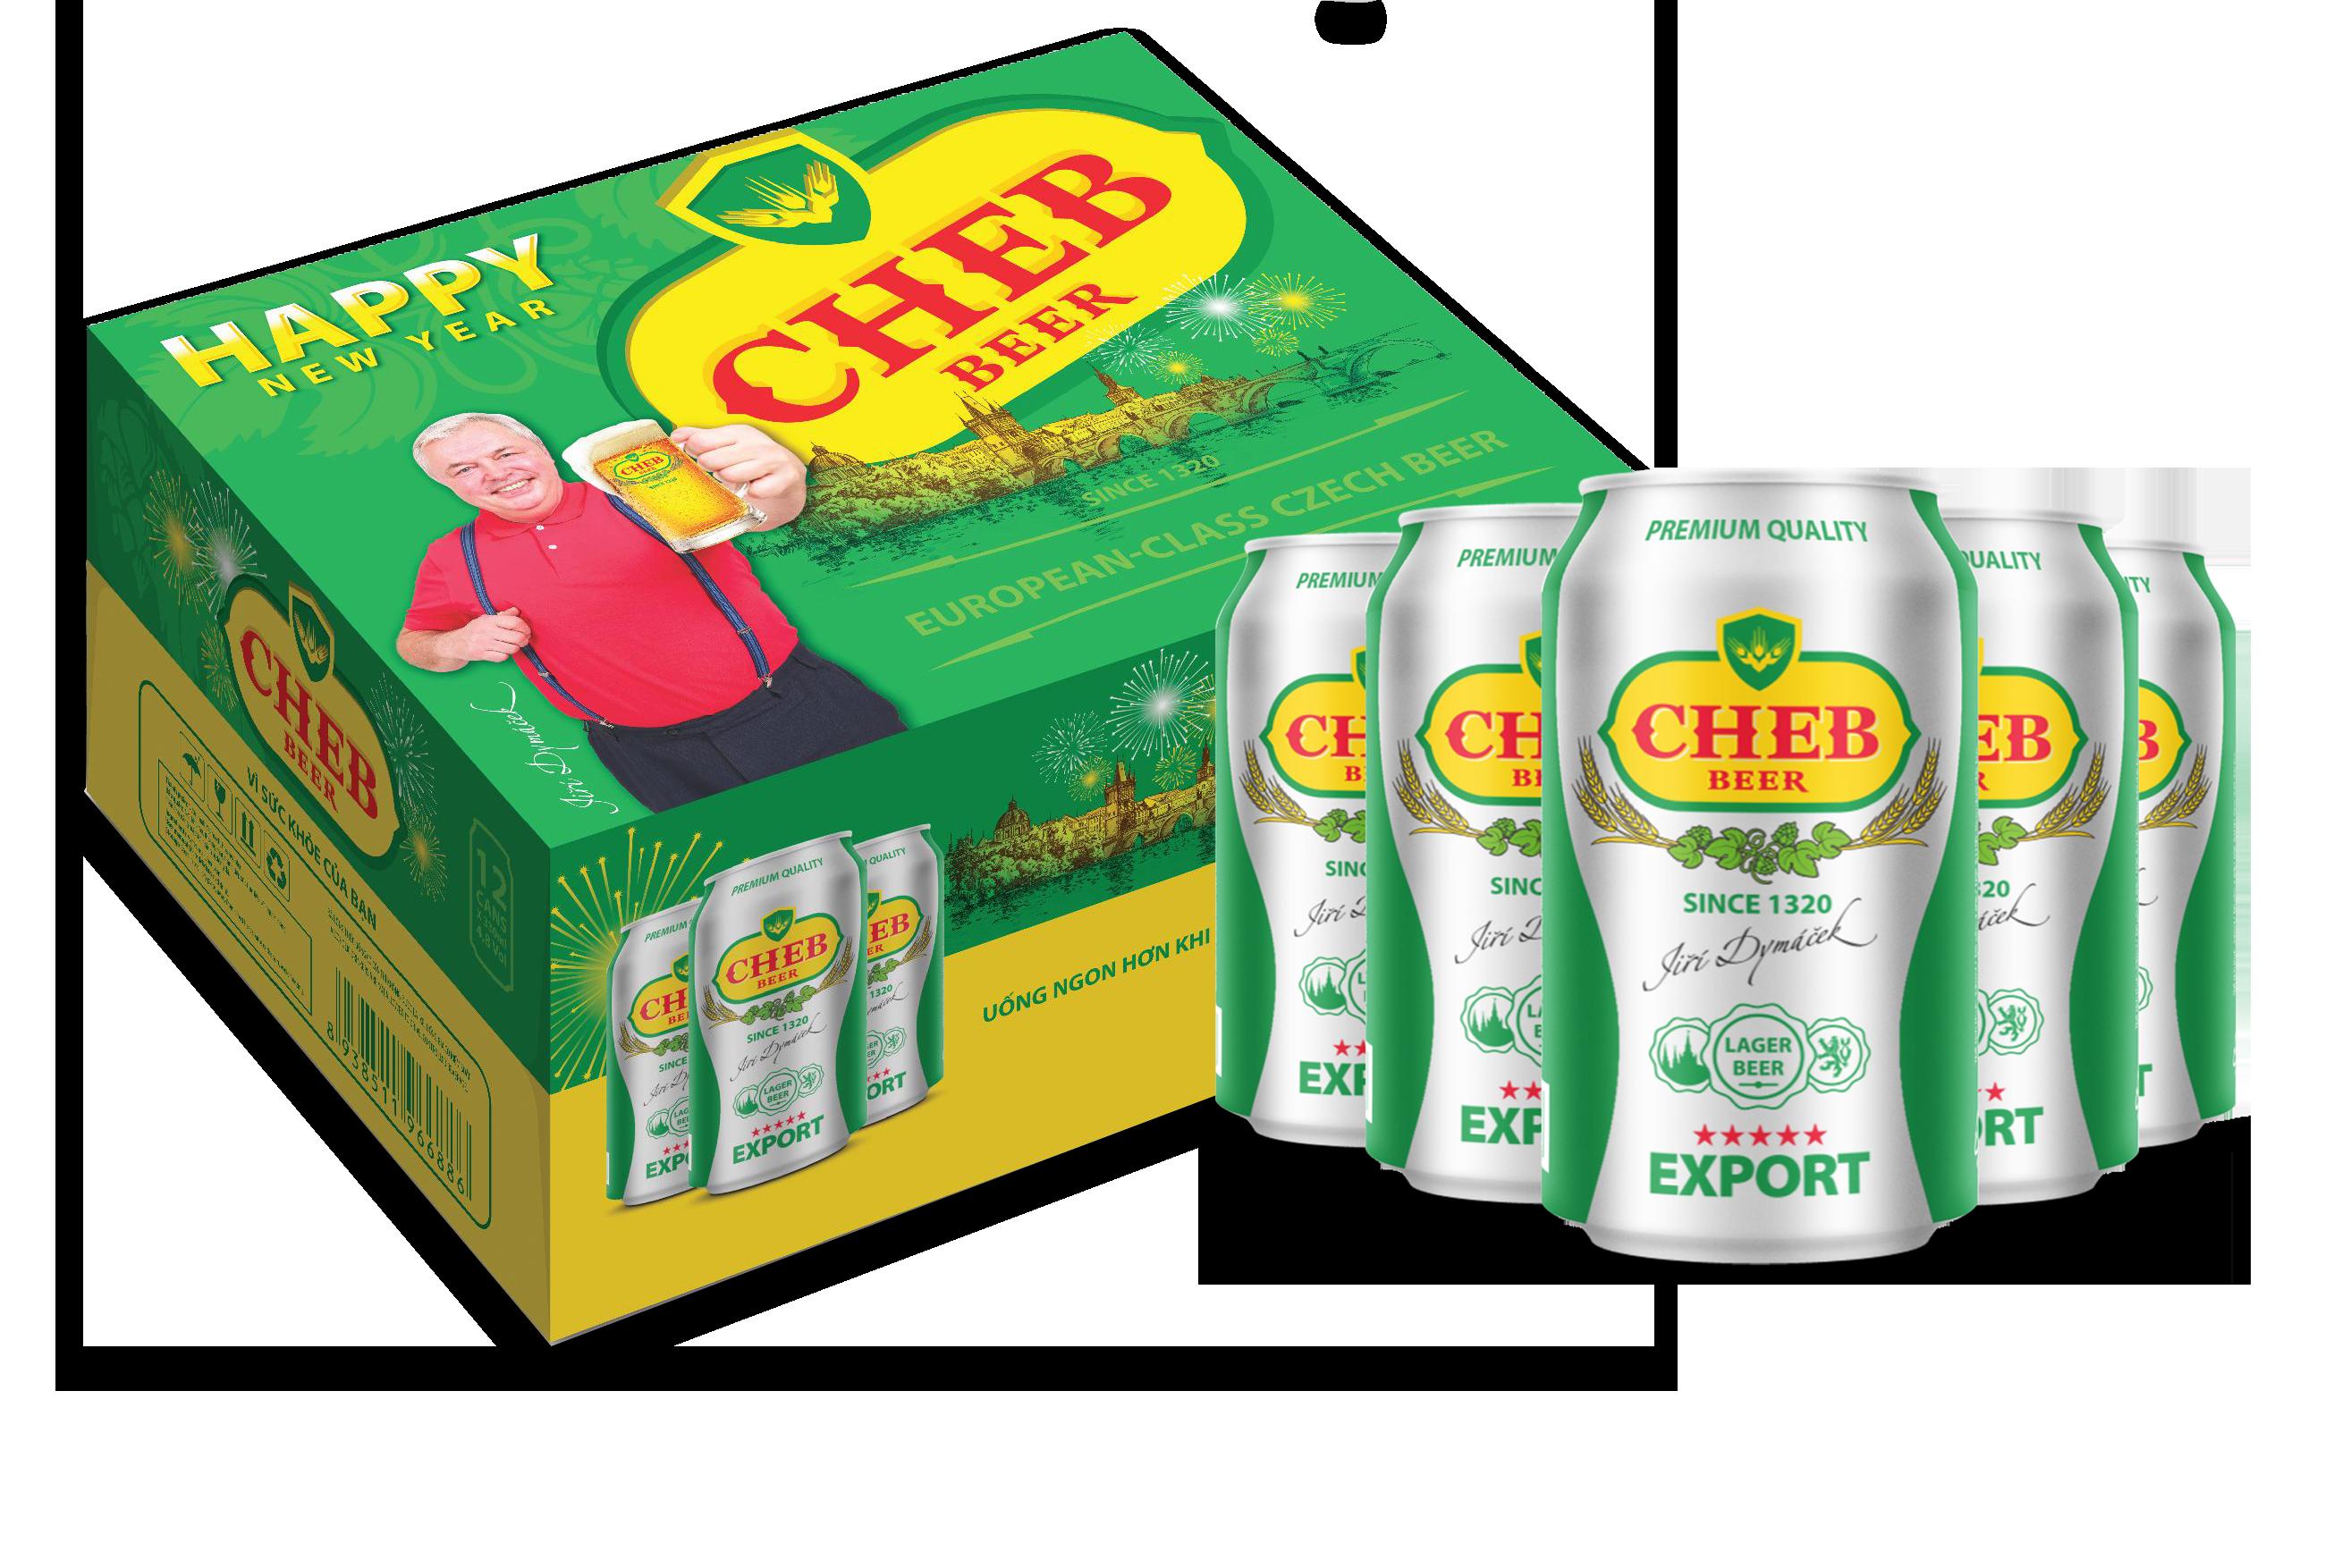 Carton of 24 cans x 330ml